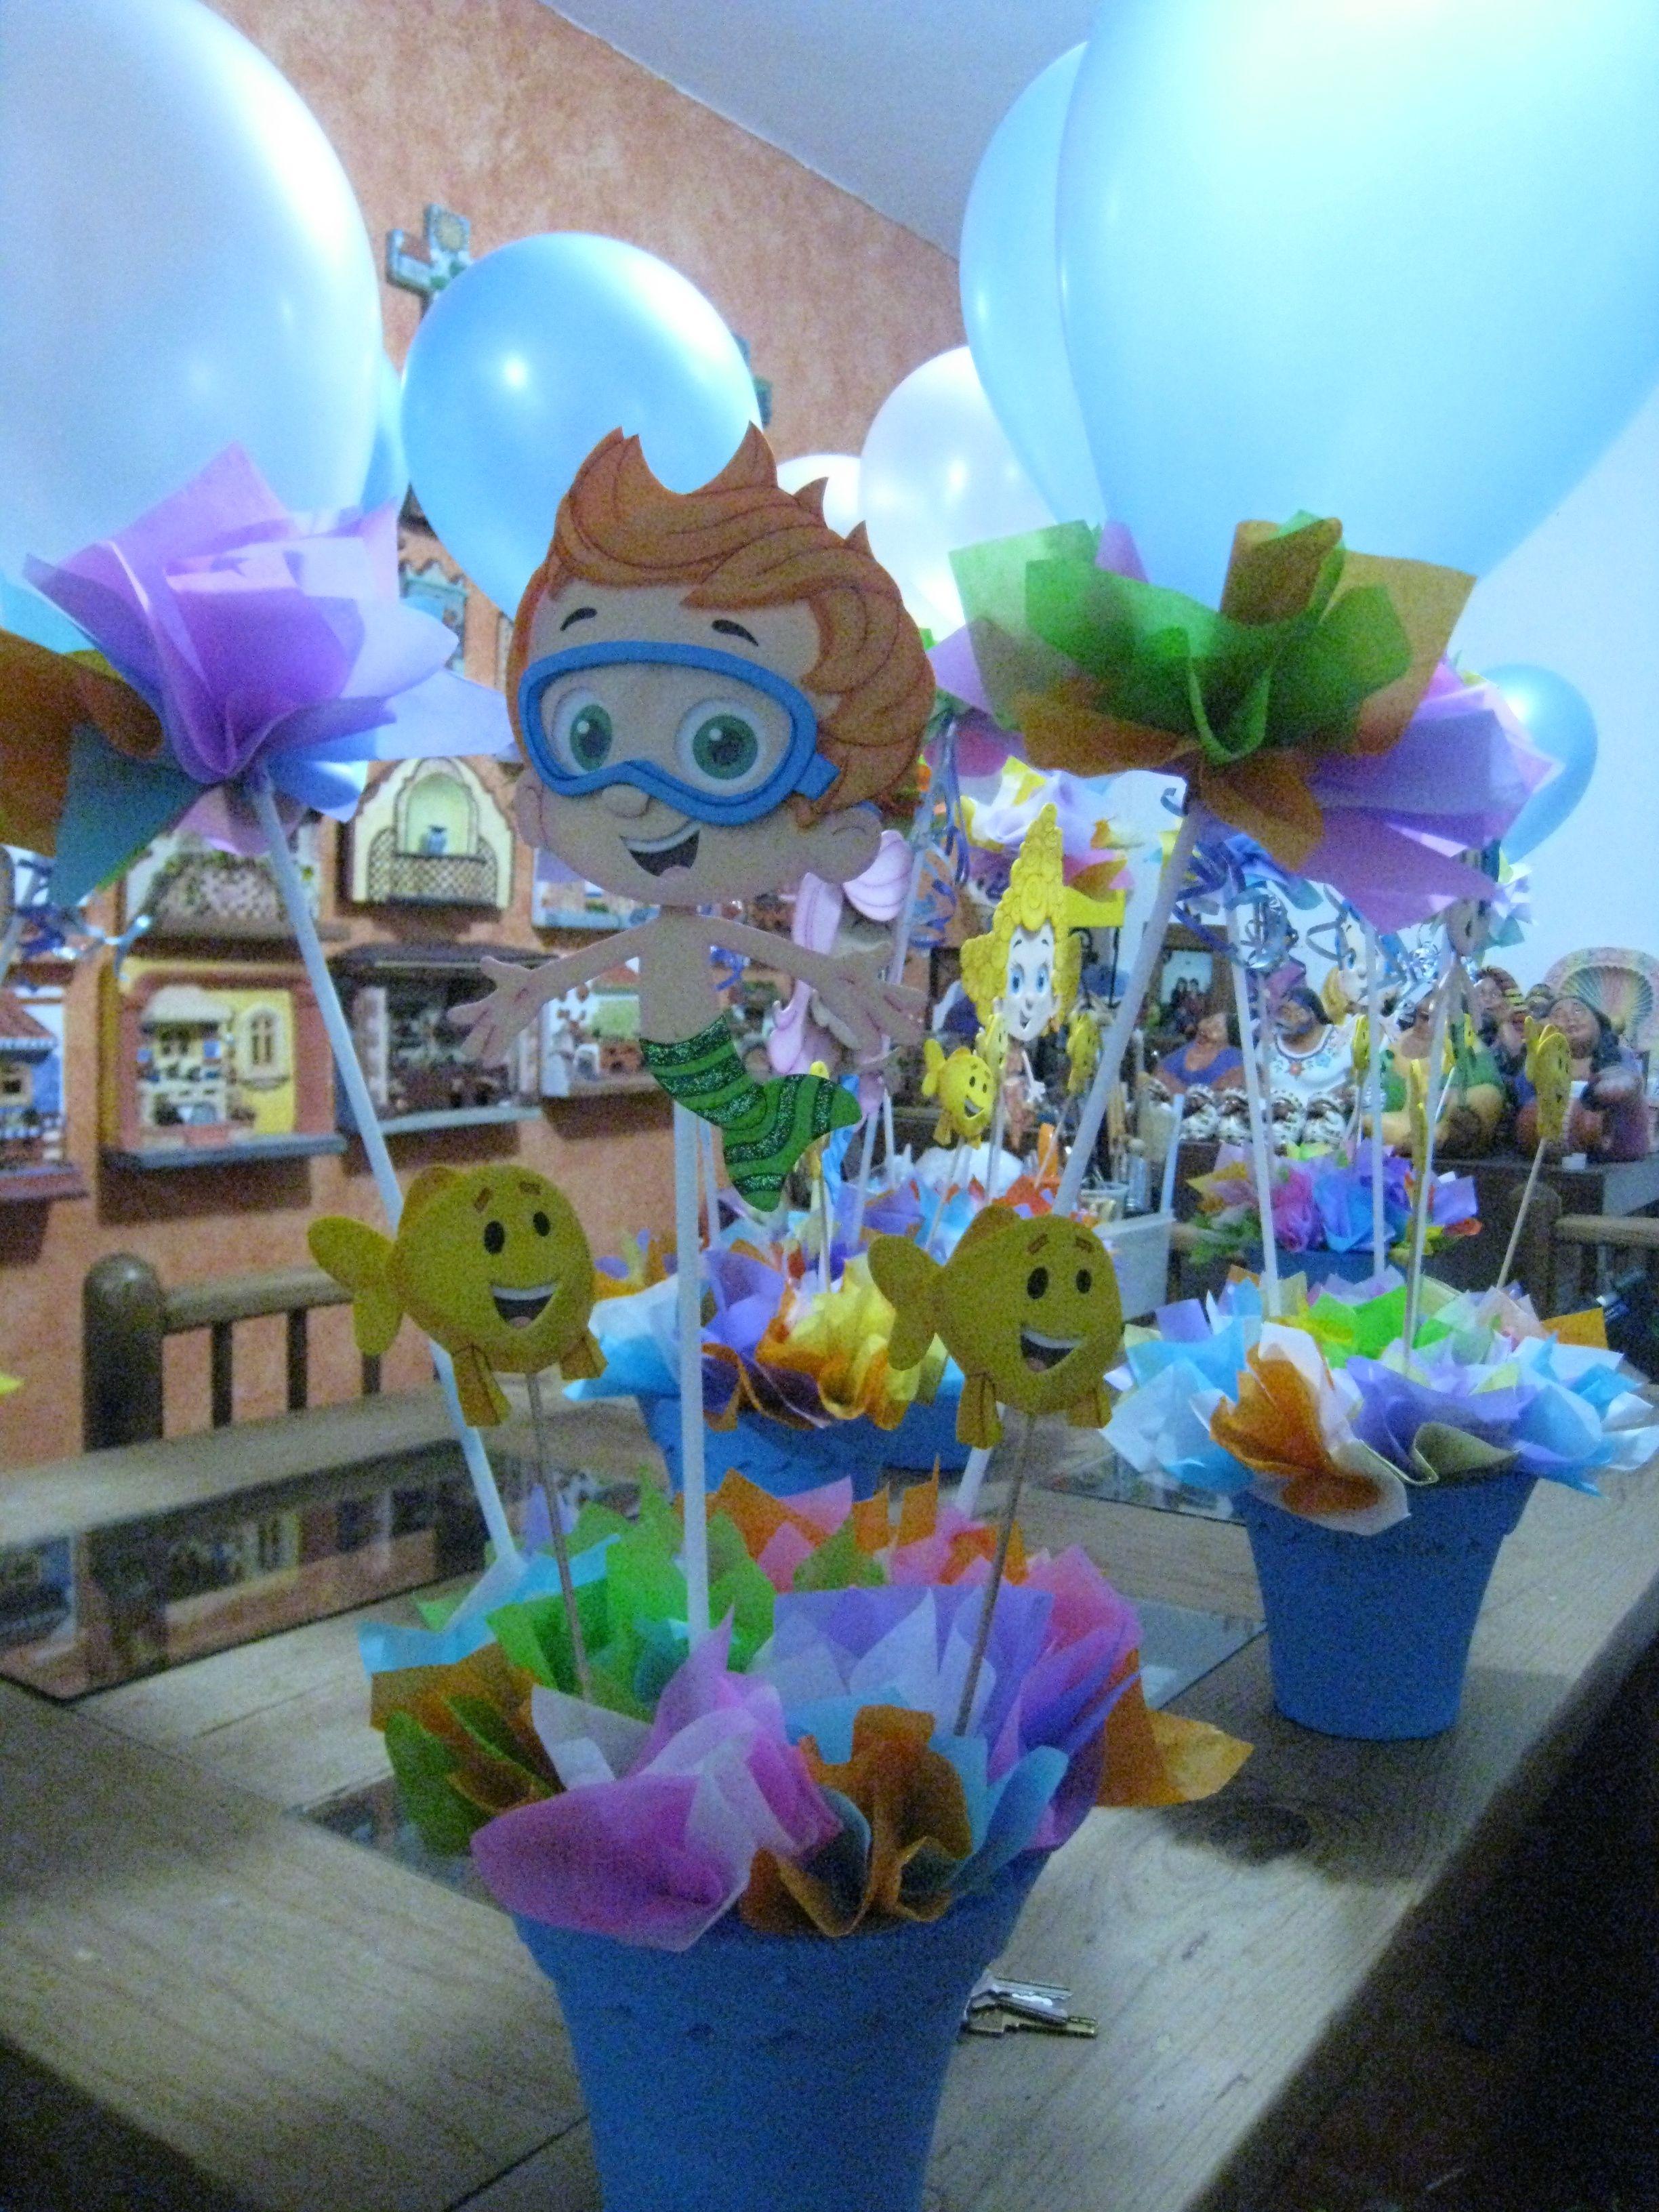 Decoracion Centros De Mesa Para Fiesta De Ninos Table Centerpieces Pool Party Centerpieces